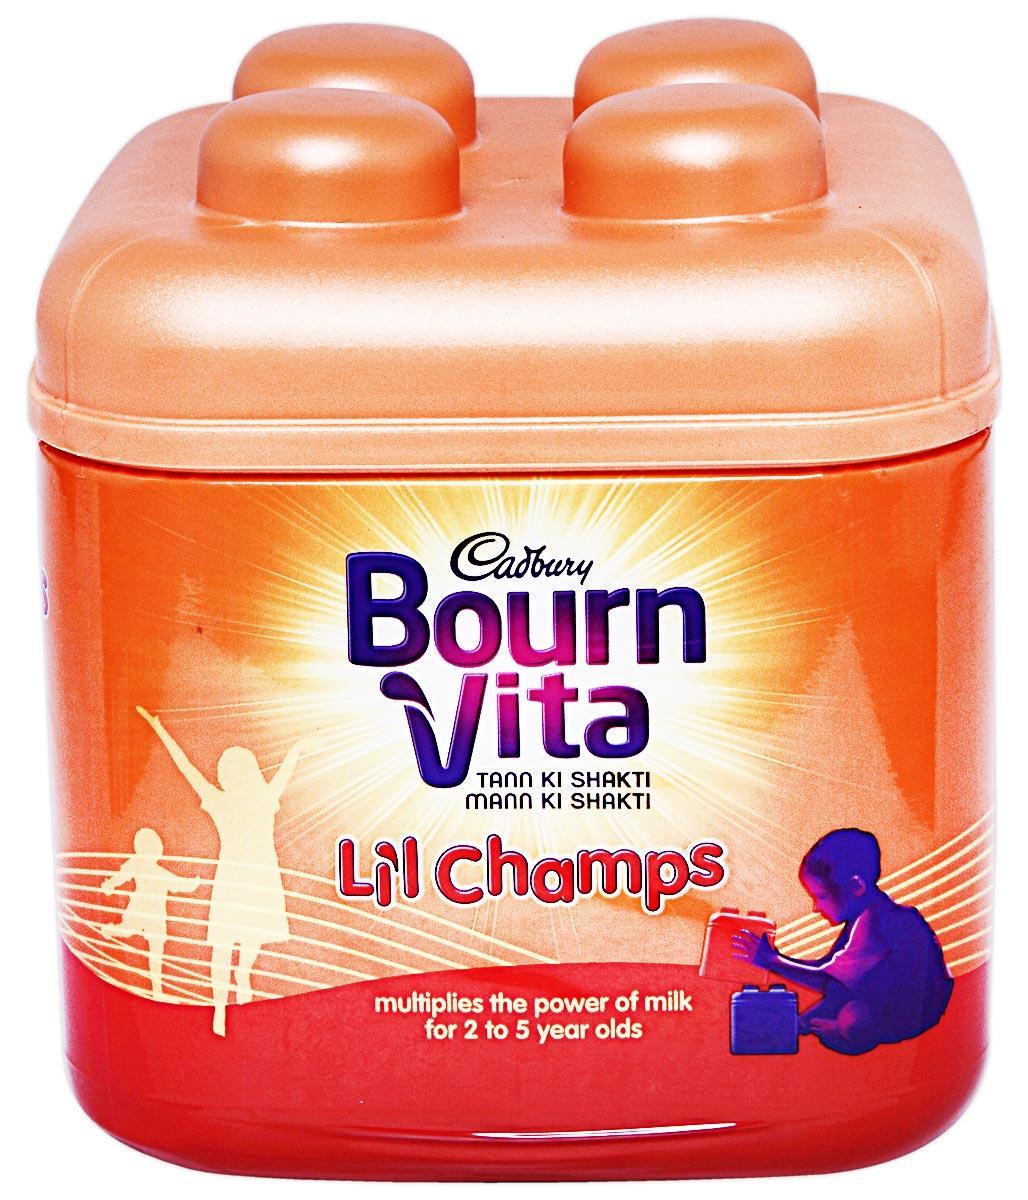 Cadbury Bournvita Little Champ Image